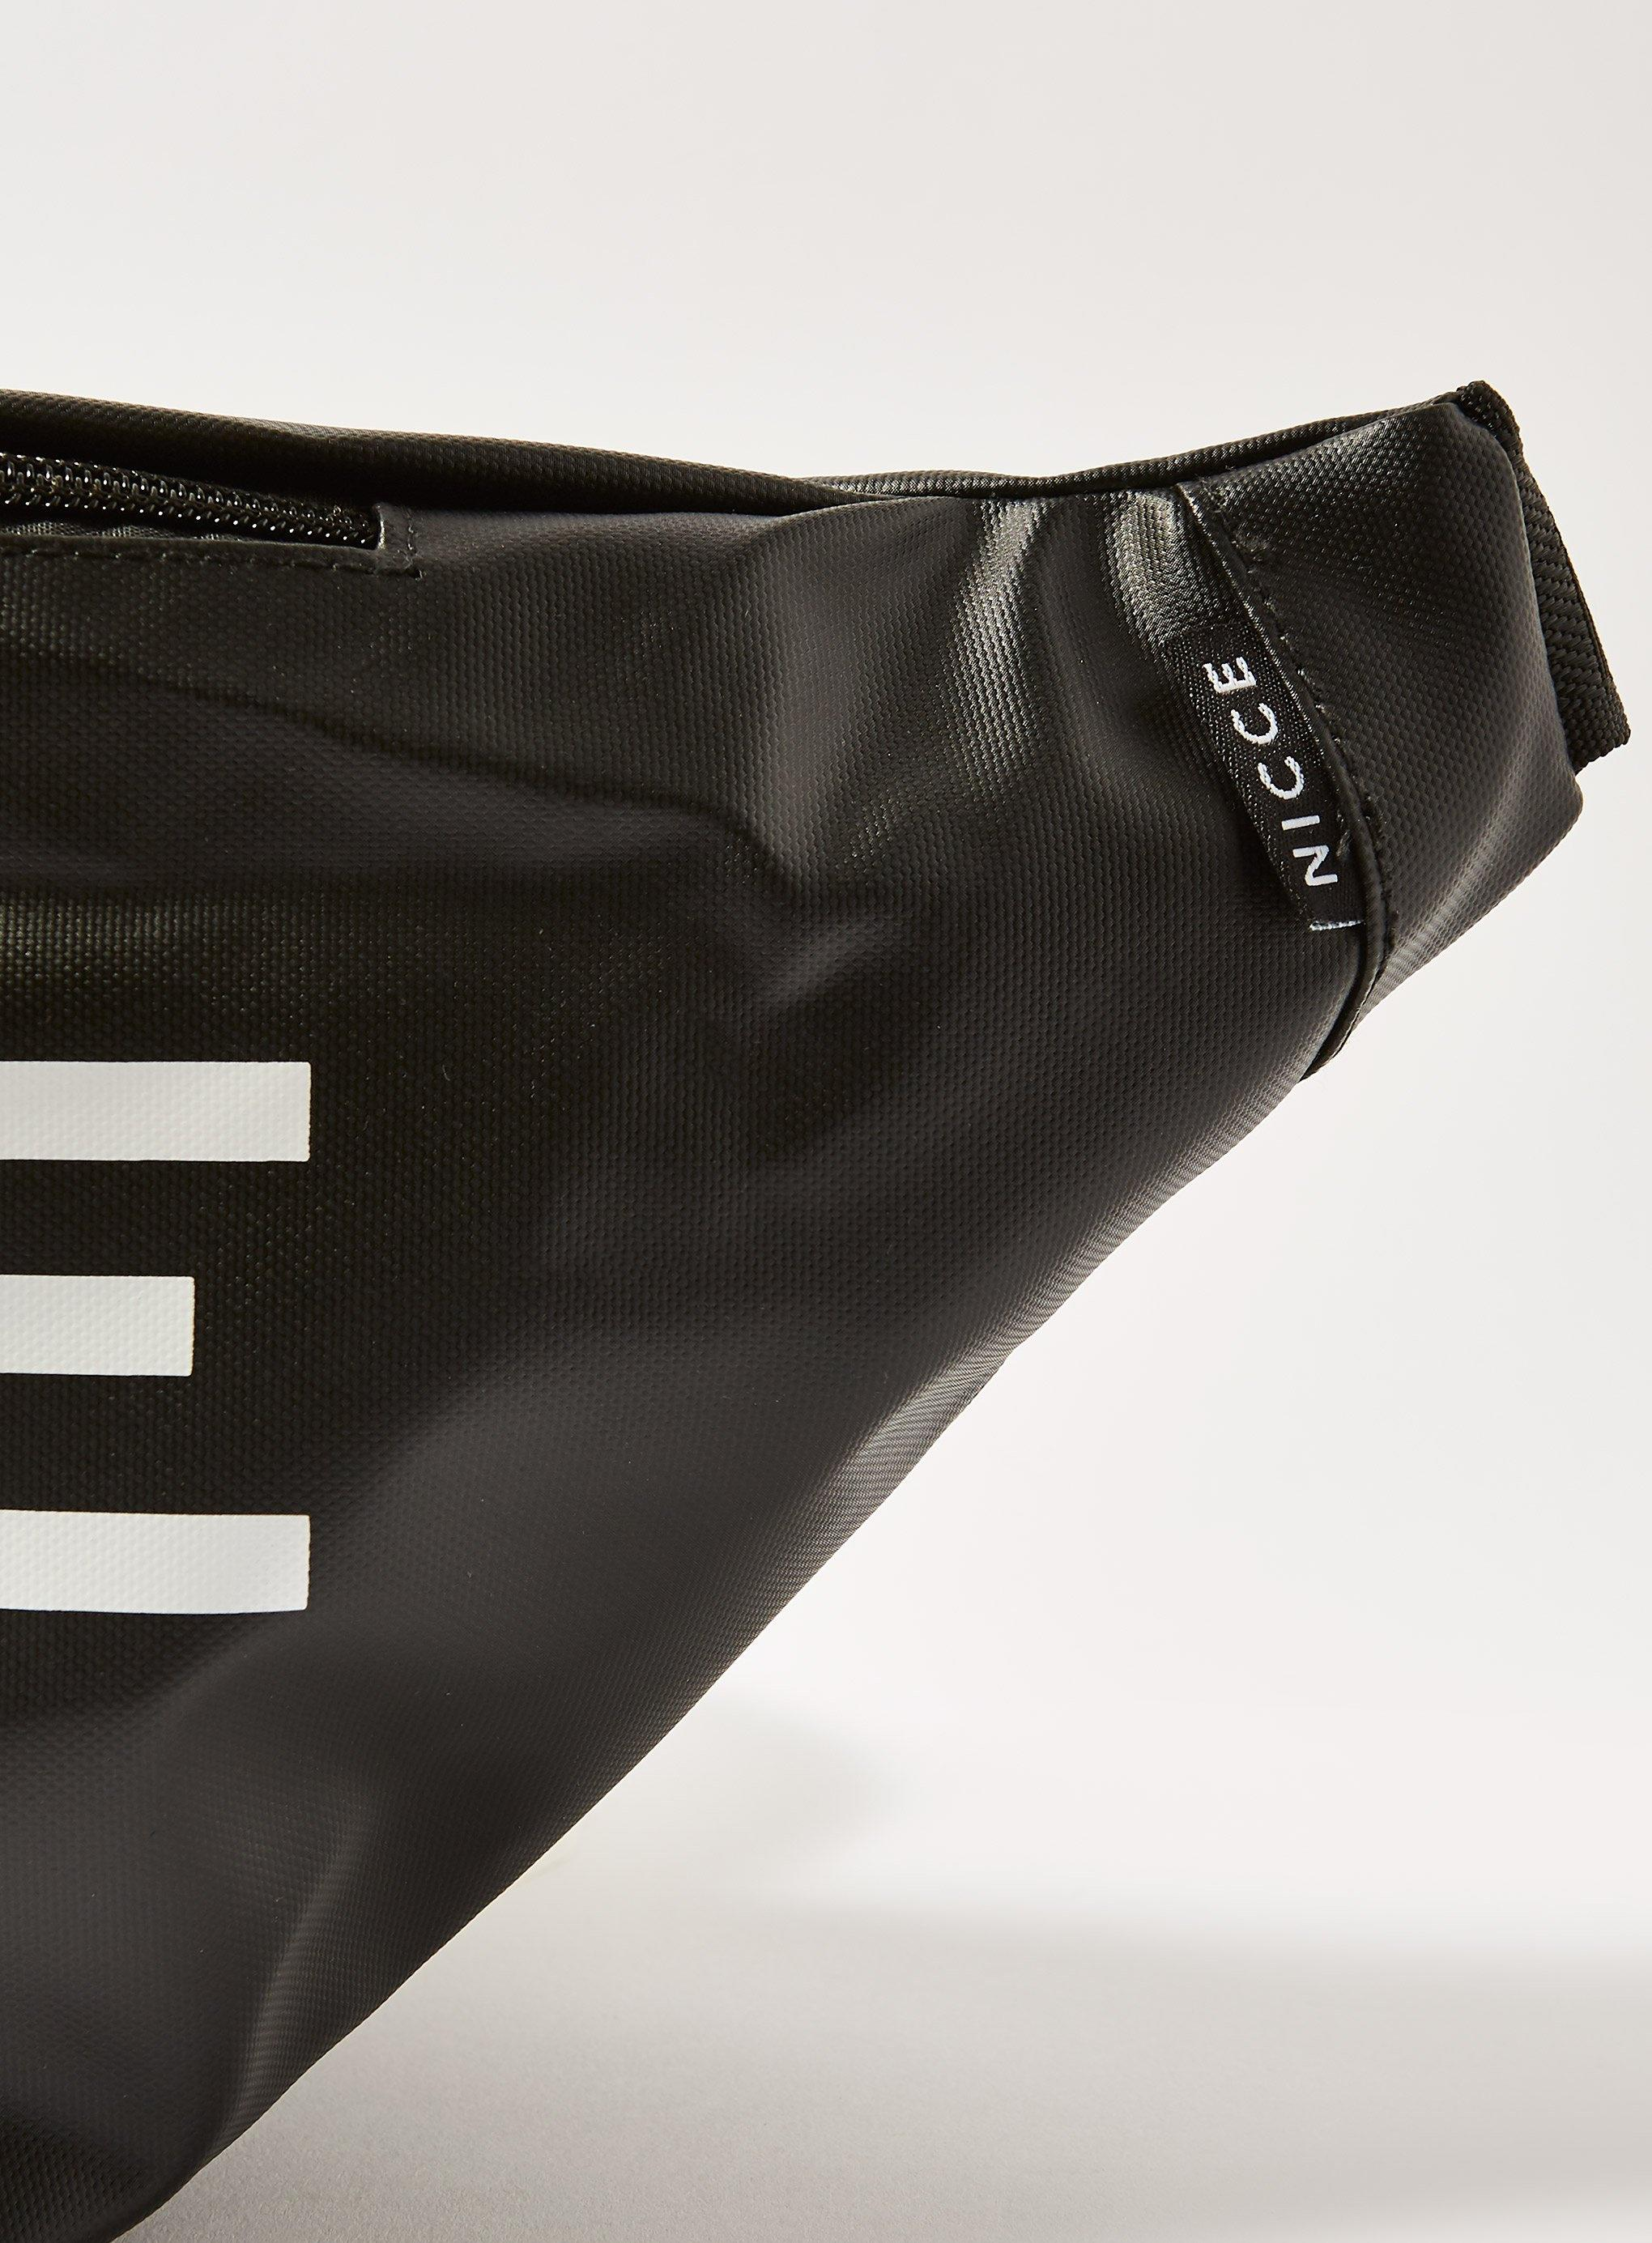 Topman - Black Nicce zero  Large Logo Cross Body Bag for Men - Lyst. View  fullscreen 57d3658a6d0c9